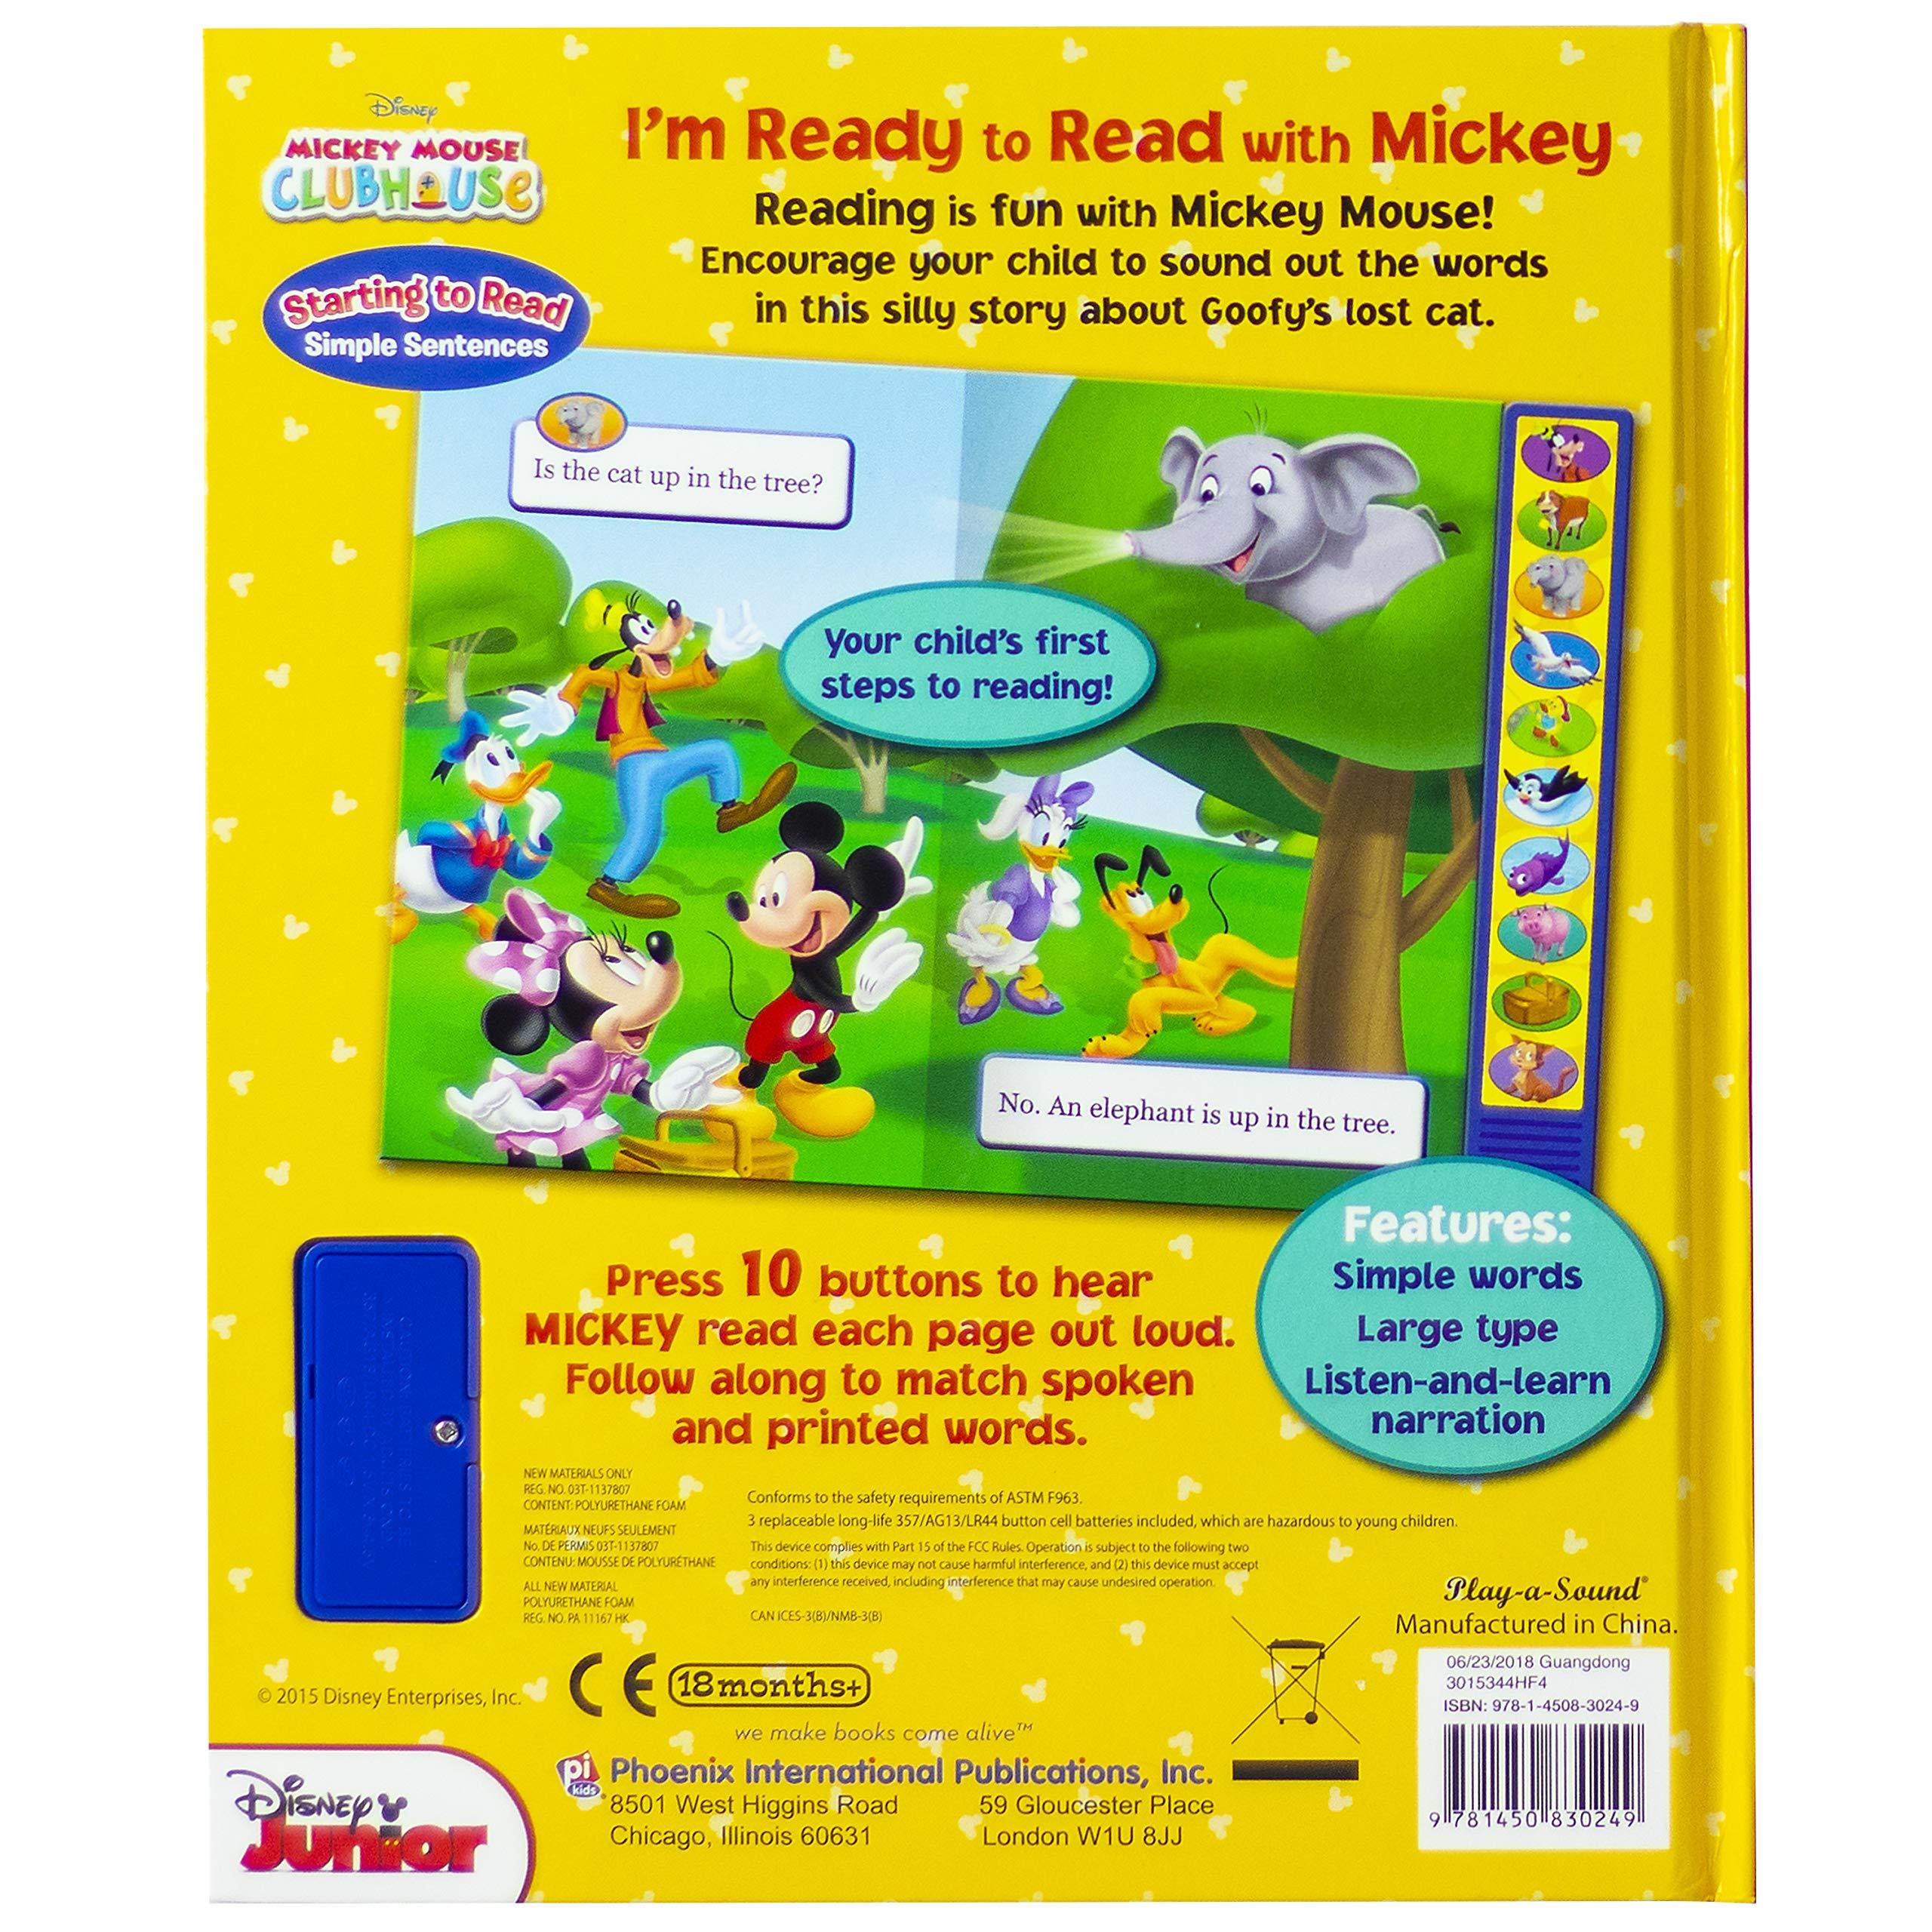 Amazon.com: Disney Mickey Mouse Clubhouse - I'm Ready to Read With Mickey -  Play-a-Sound - PI Kids (9781450830249): Jennifer H. Keast, Editors of  Phoenix ...